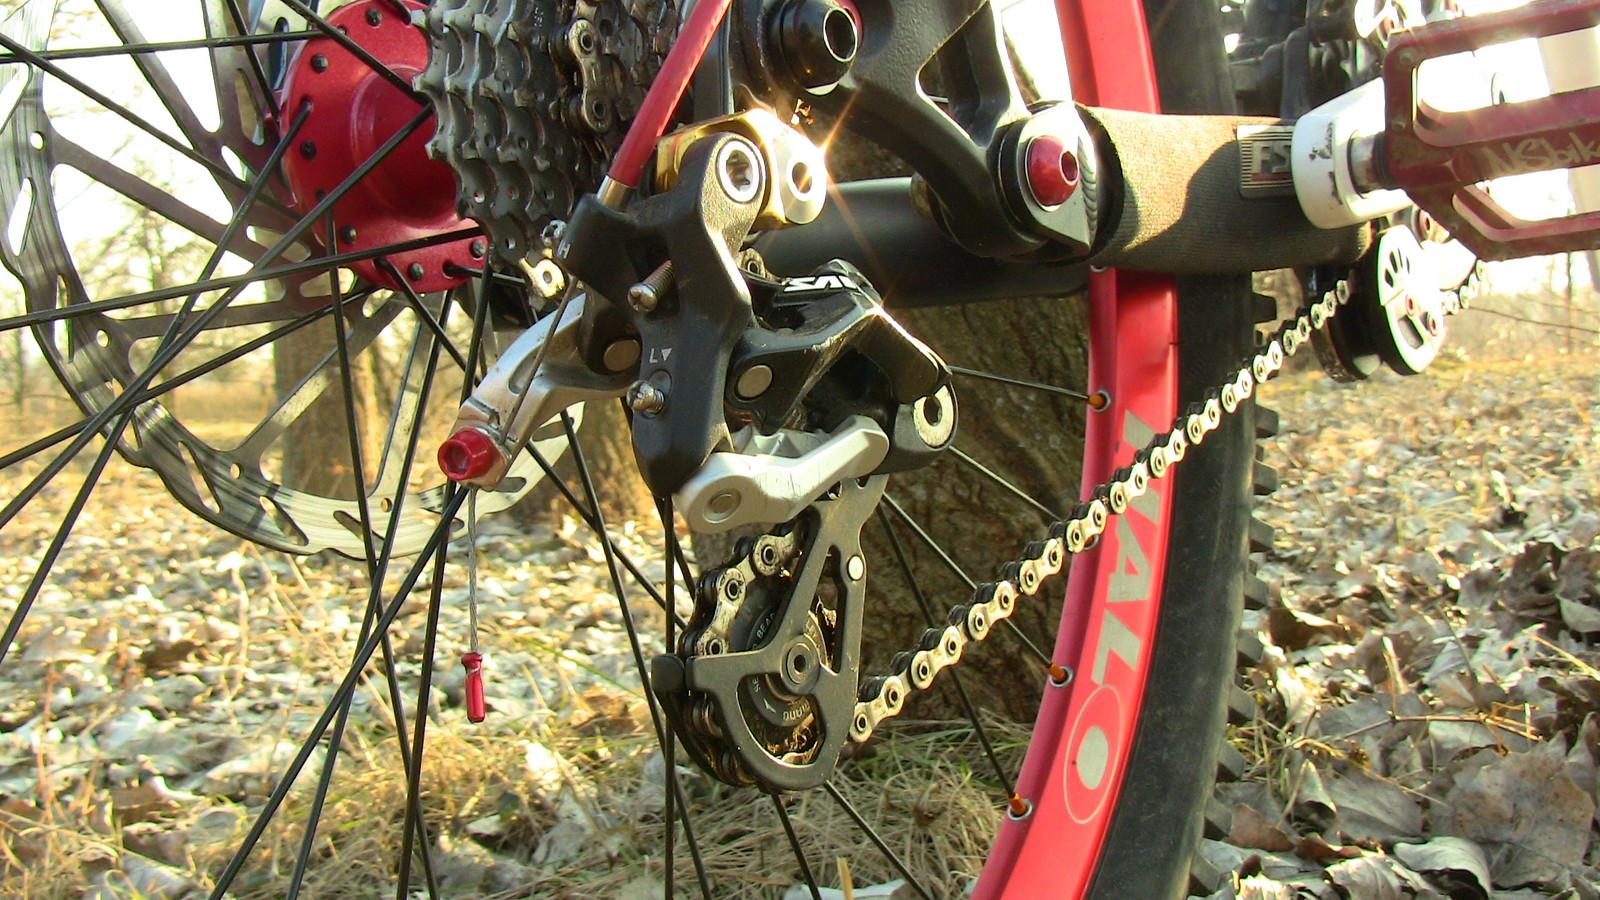 Big hit fsr3 - zsooooti - Mountain Biking Pictures - Vital MTB